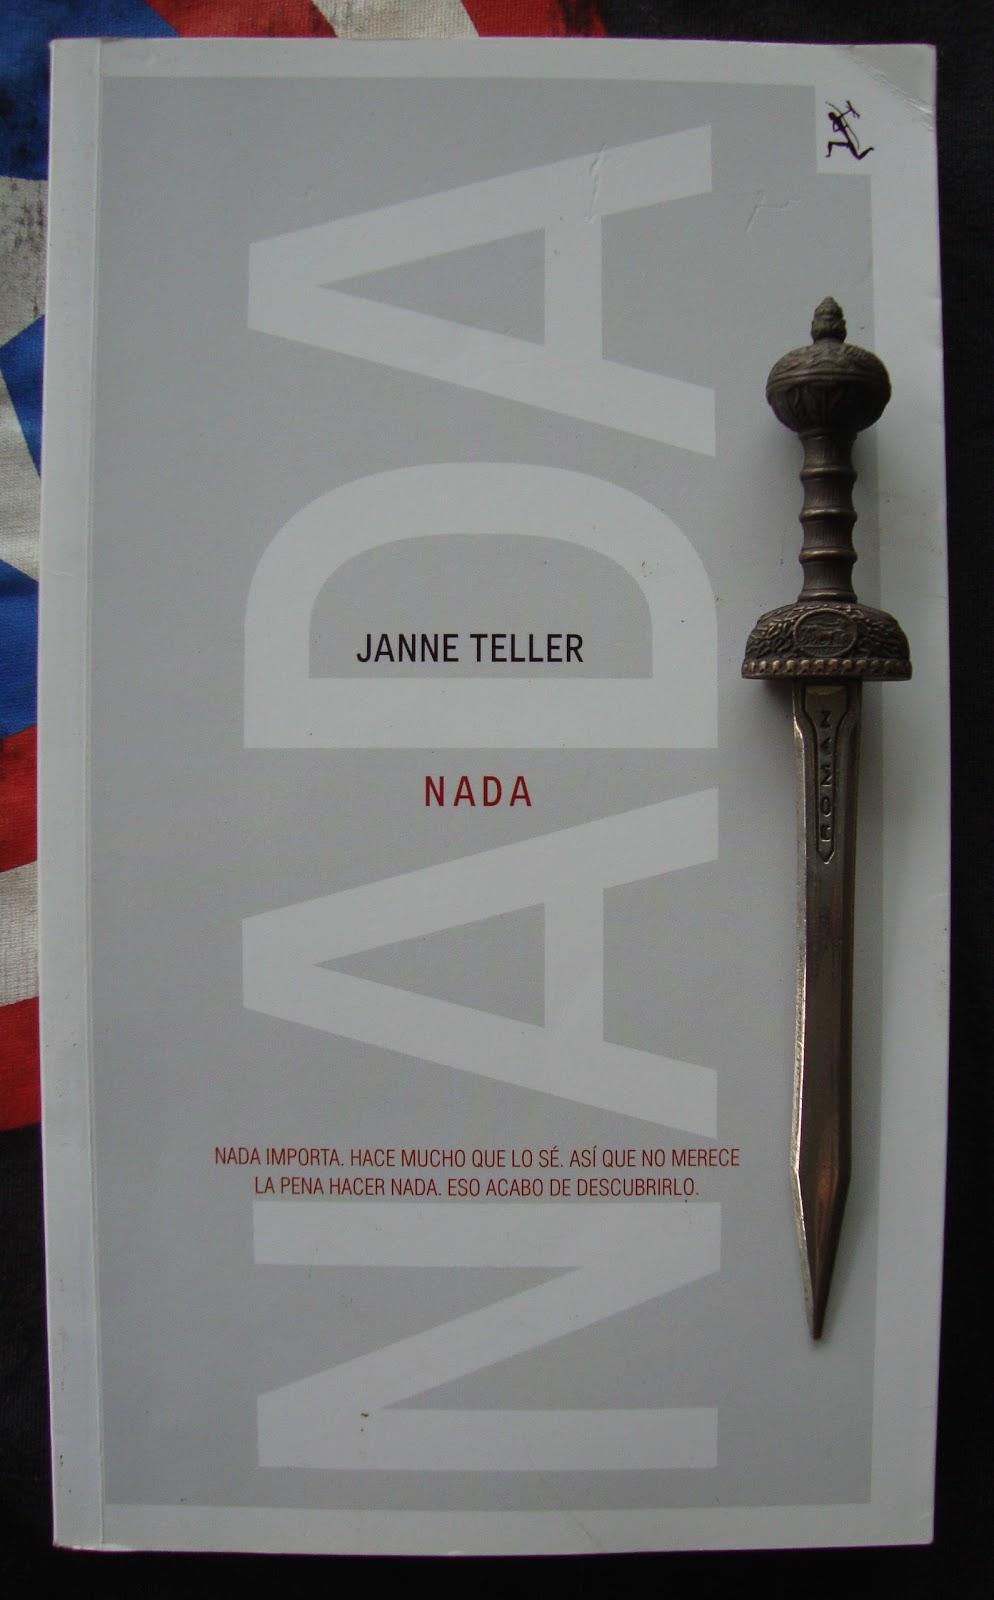 JANNE TELLER NADA DOWNLOAD